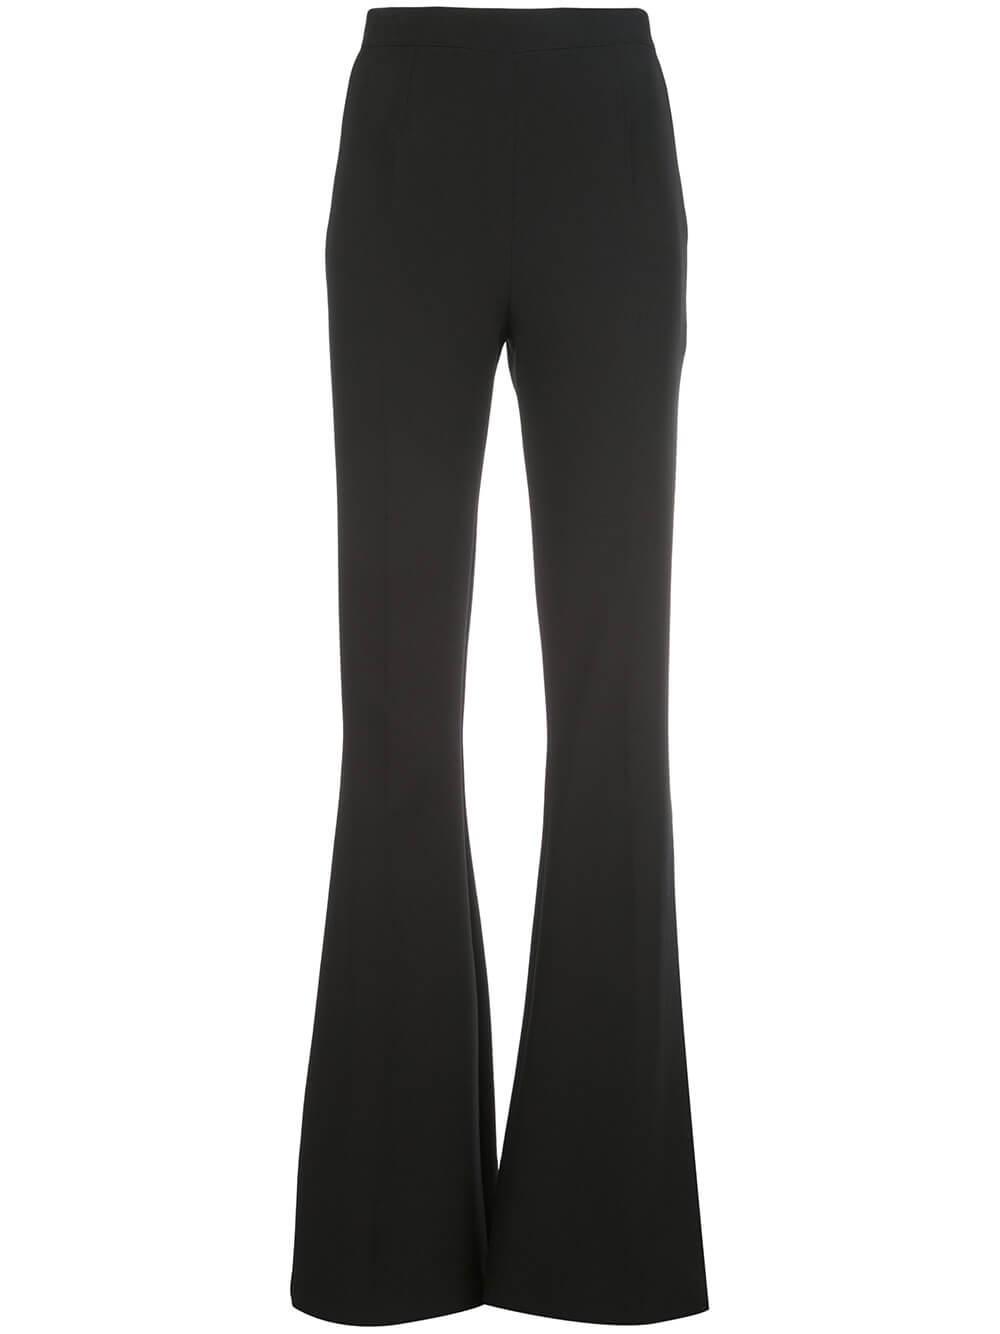 Halluana Side Zip Trouser Item # P39-1-R20